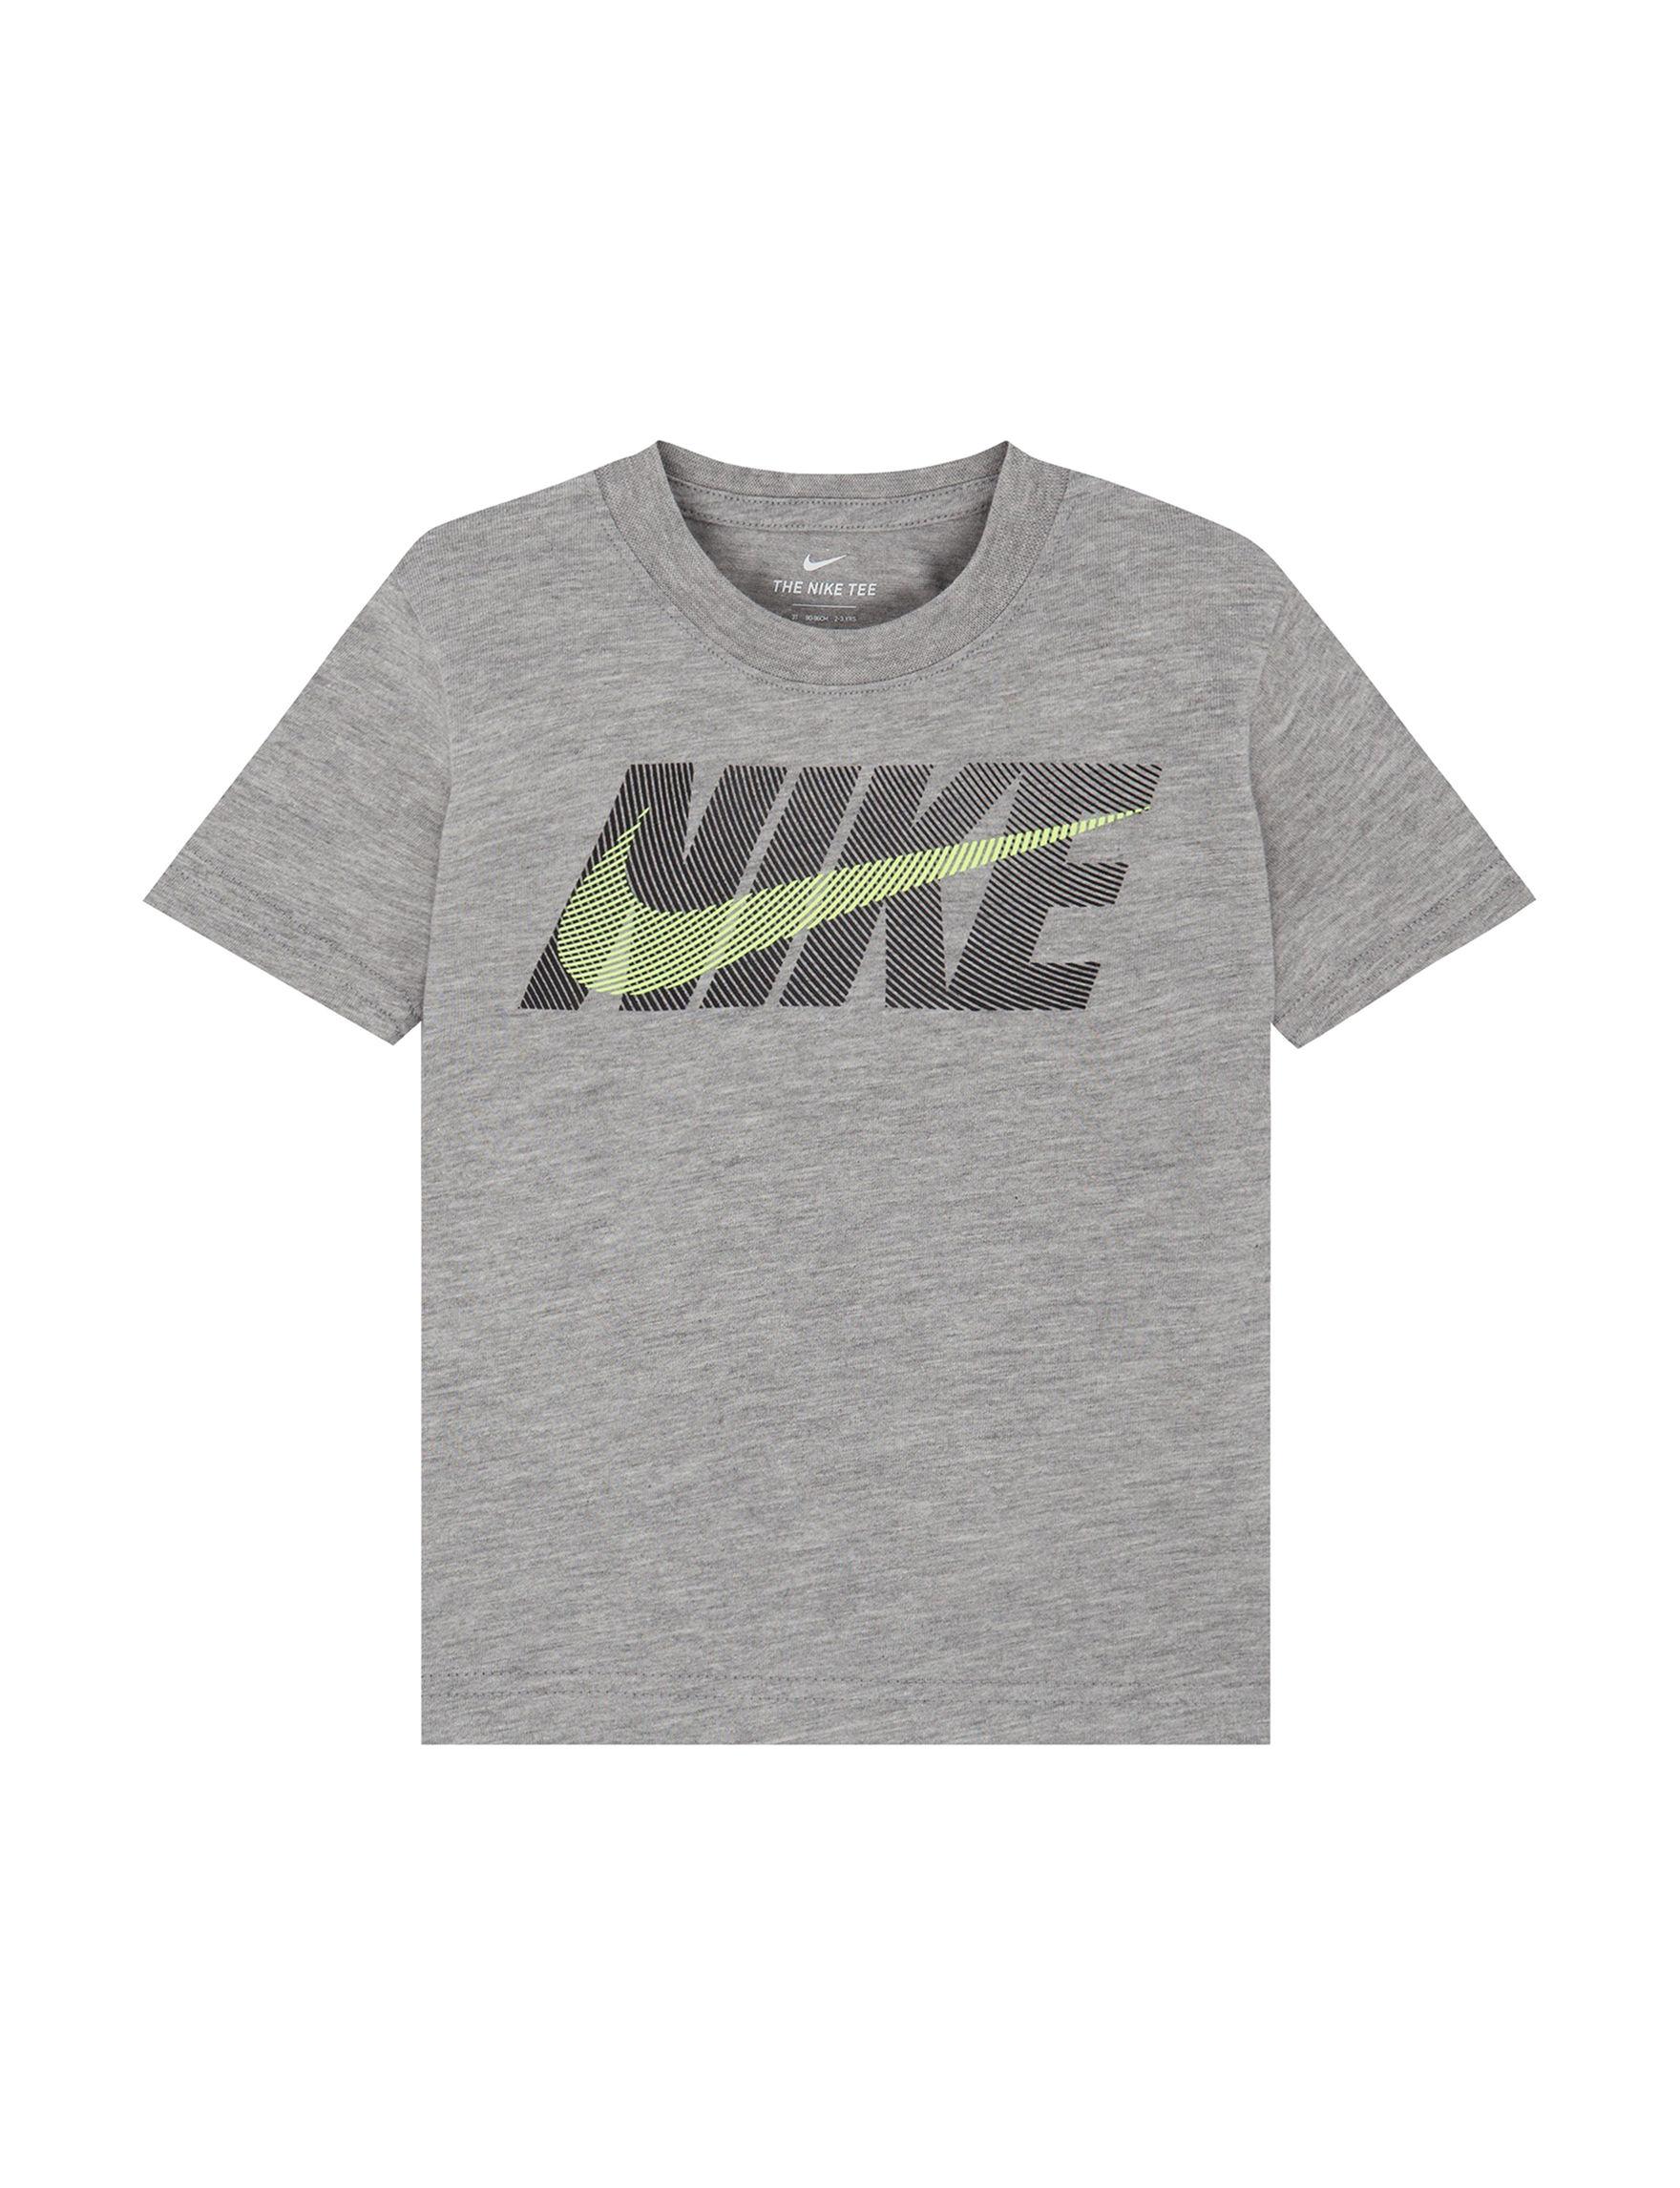 Nike Heather Grey